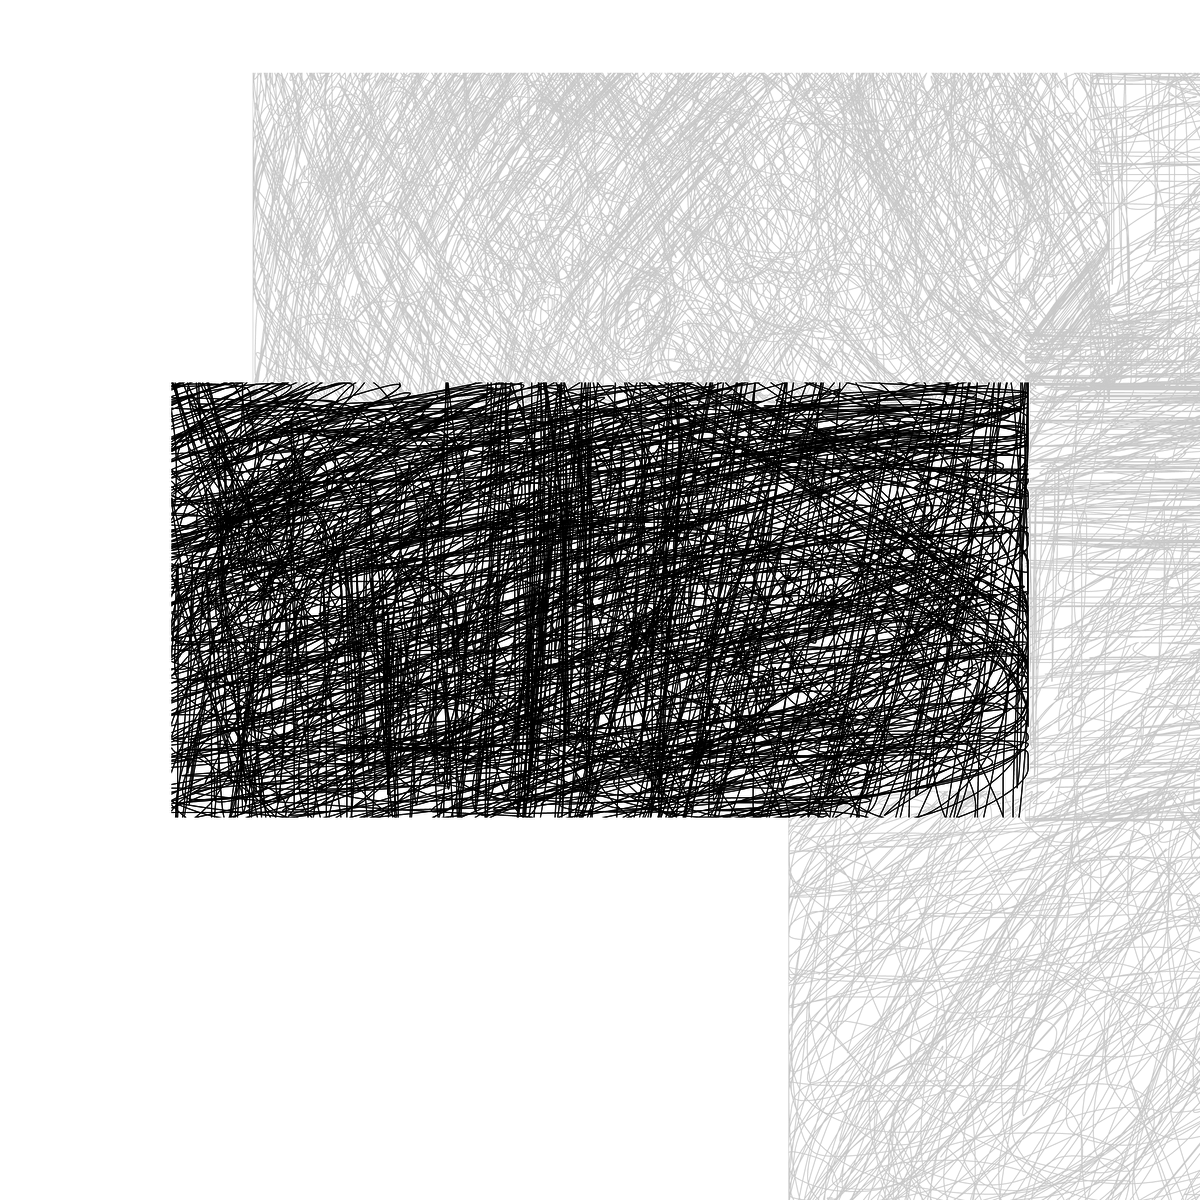 BAAAM drawing#23387 lat:46.5208930969238300lng: 6.6337203979492190